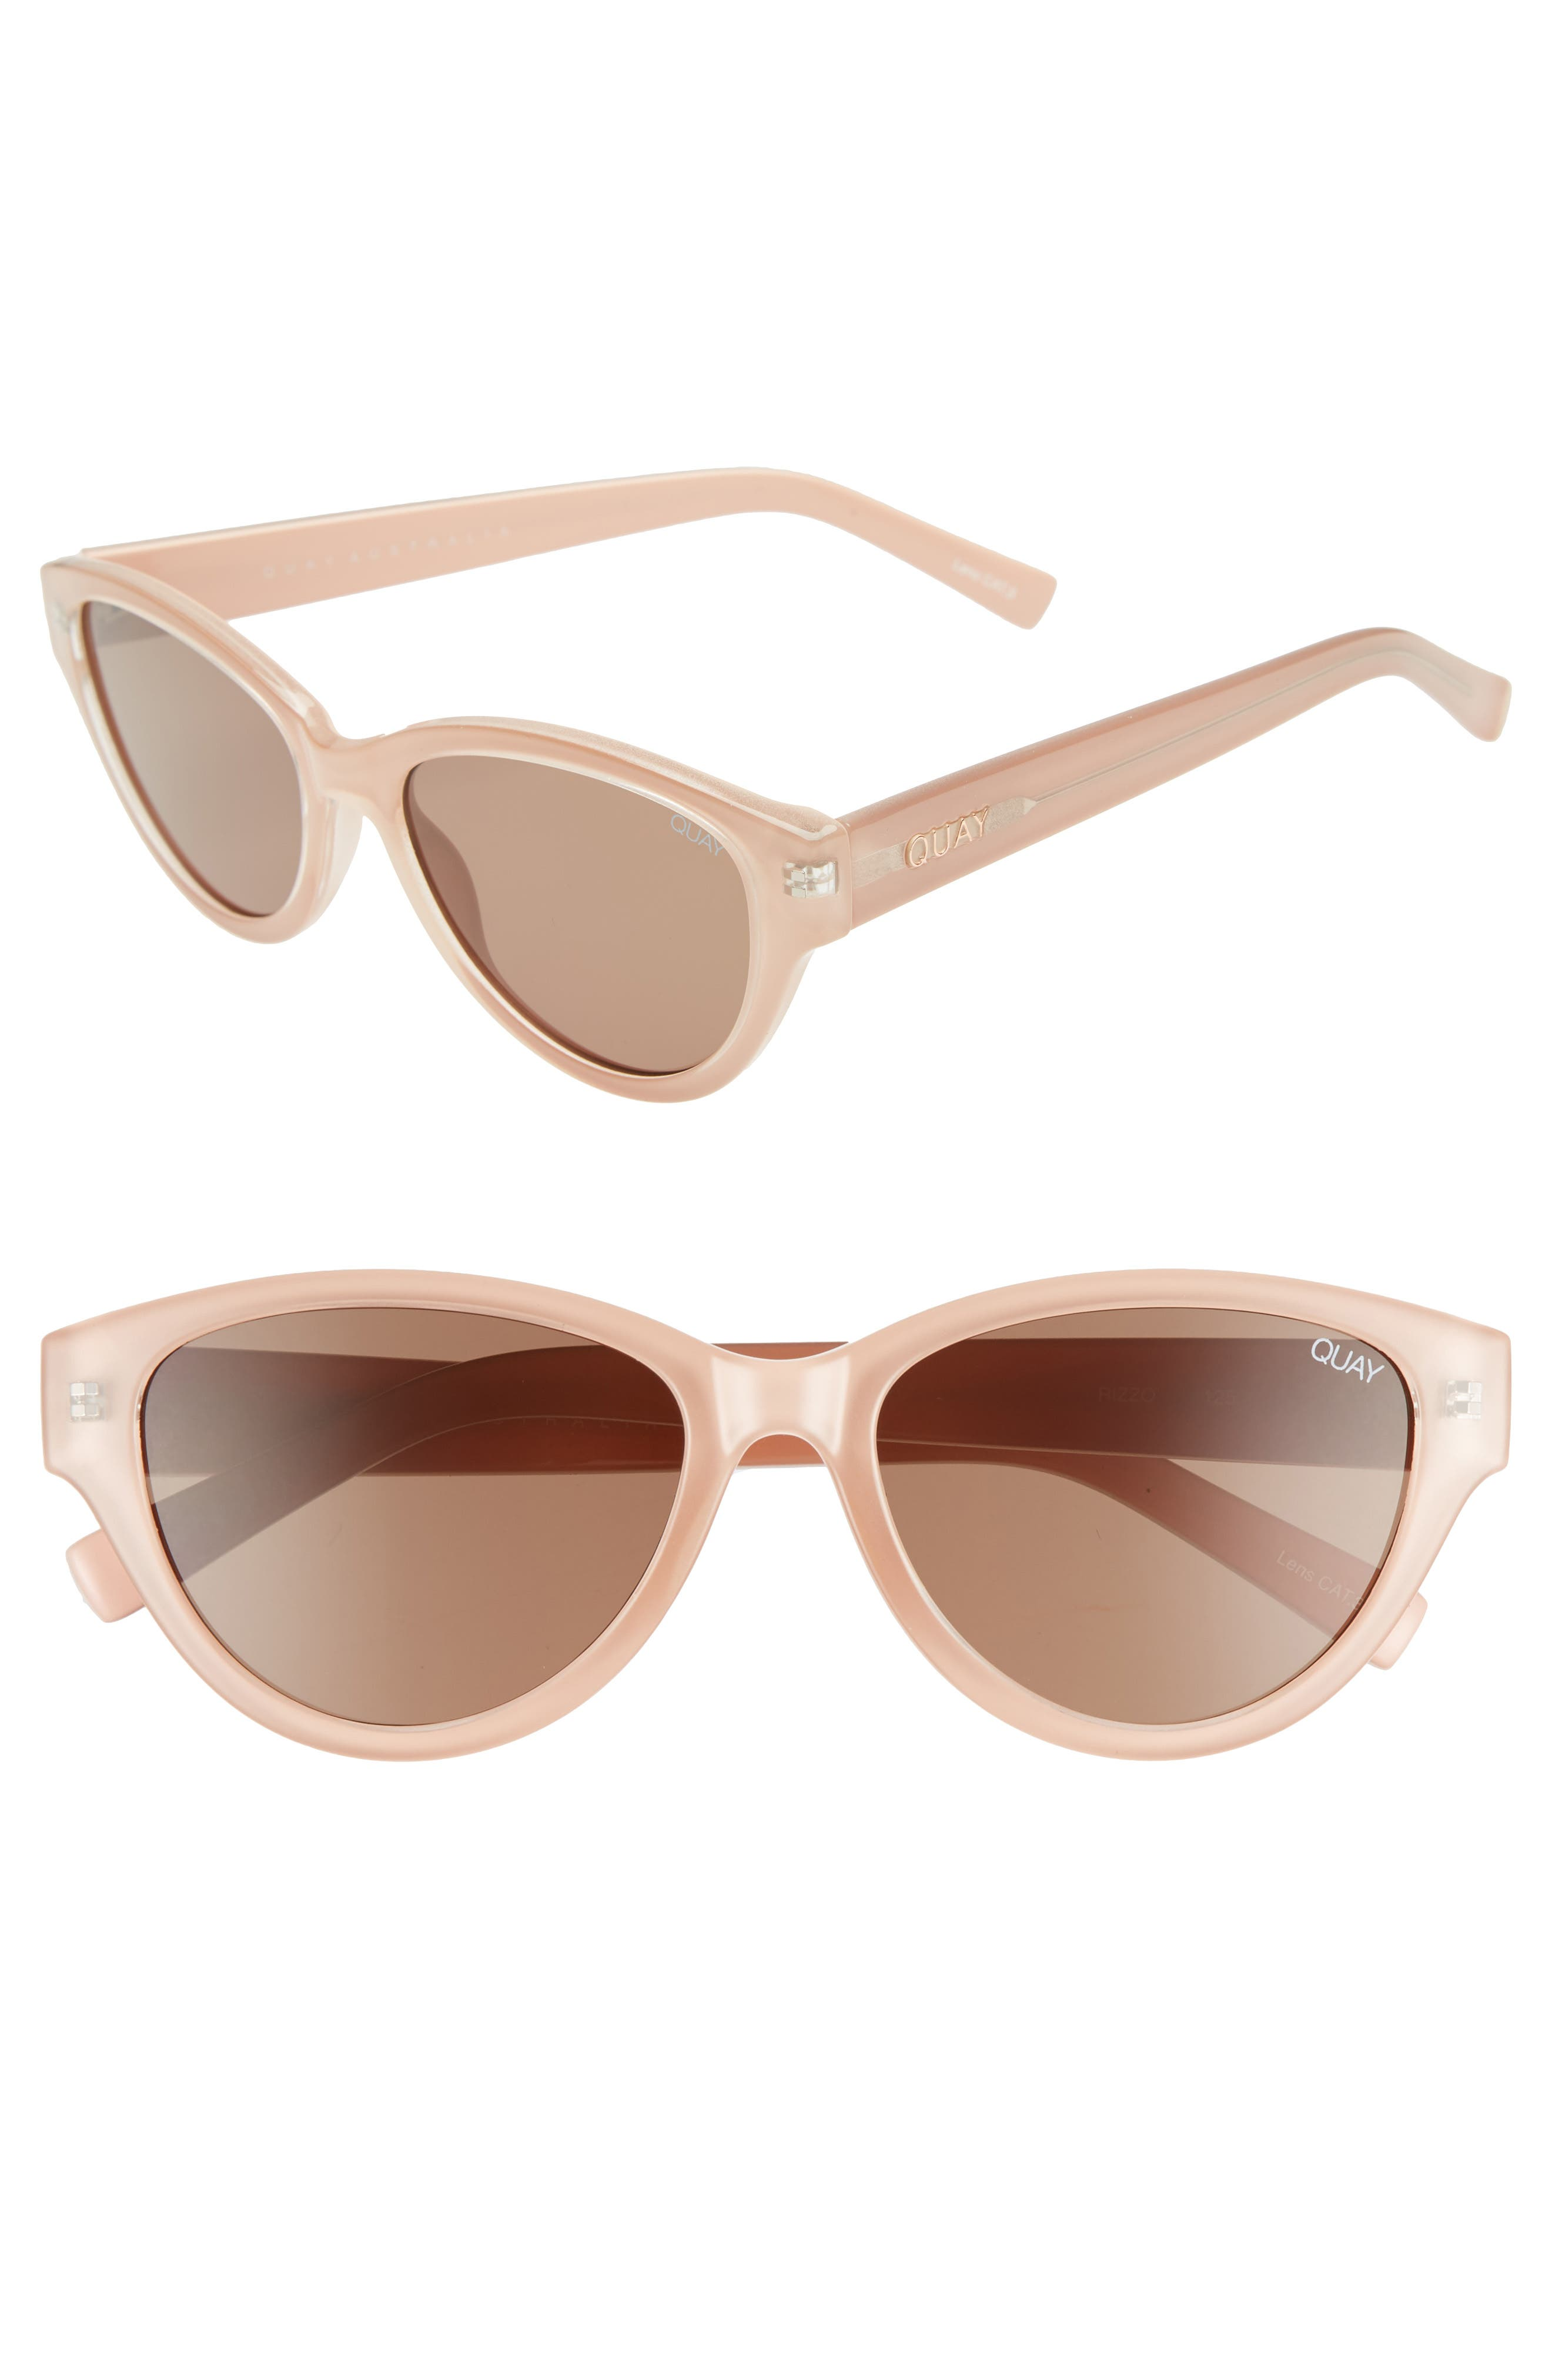 Rizzo 55mm Cat Eye Sunglasses,                             Main thumbnail 1, color,                             CREAM/ BROWN